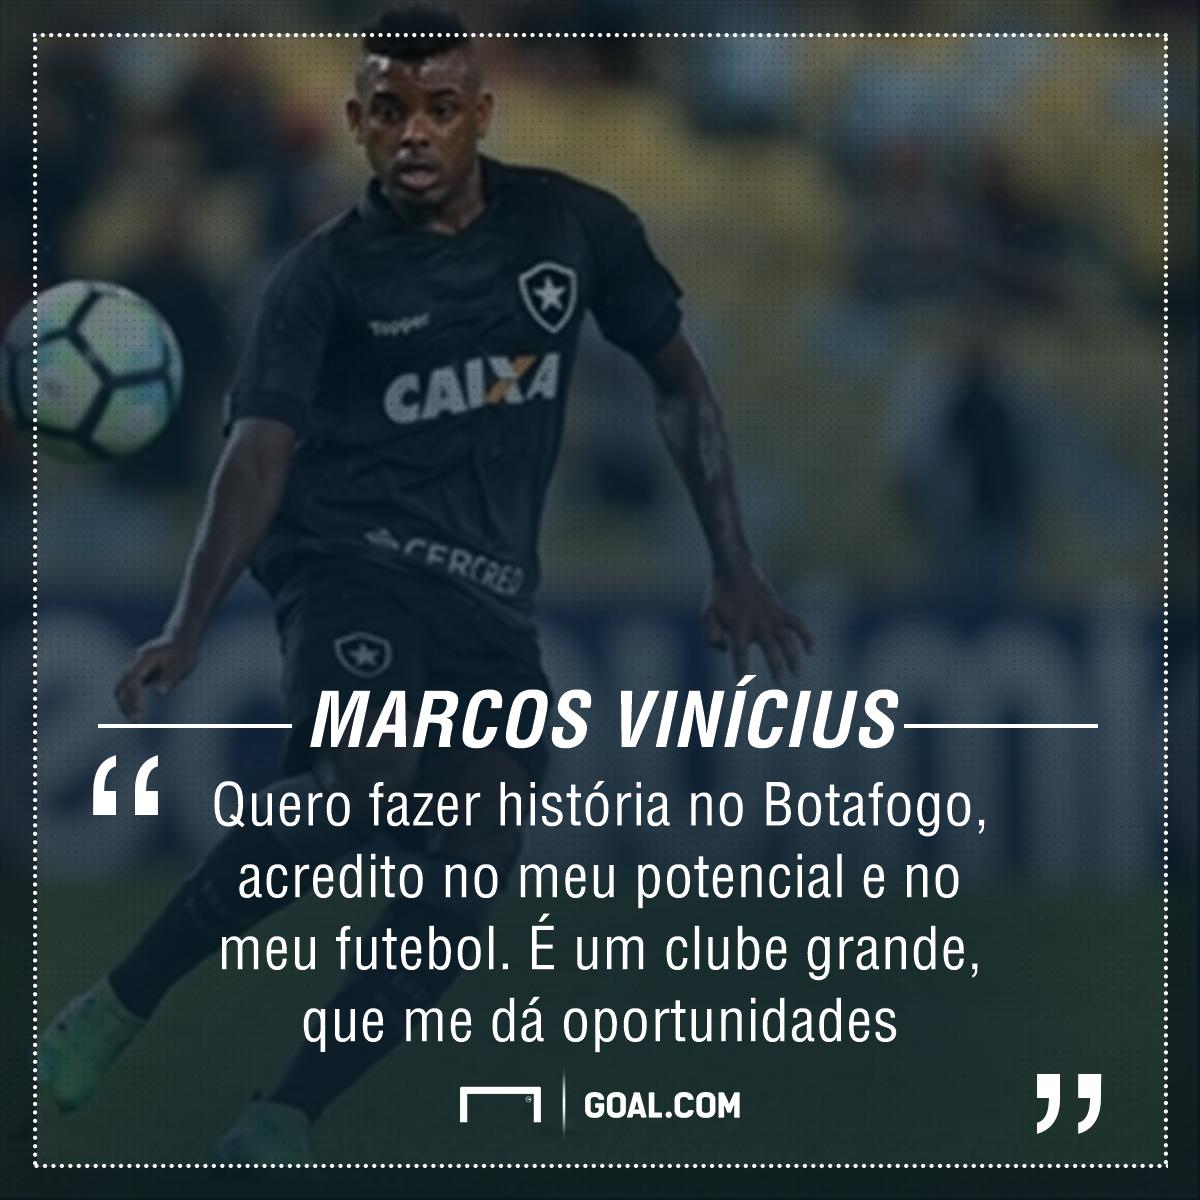 PS Marcos Vinicius